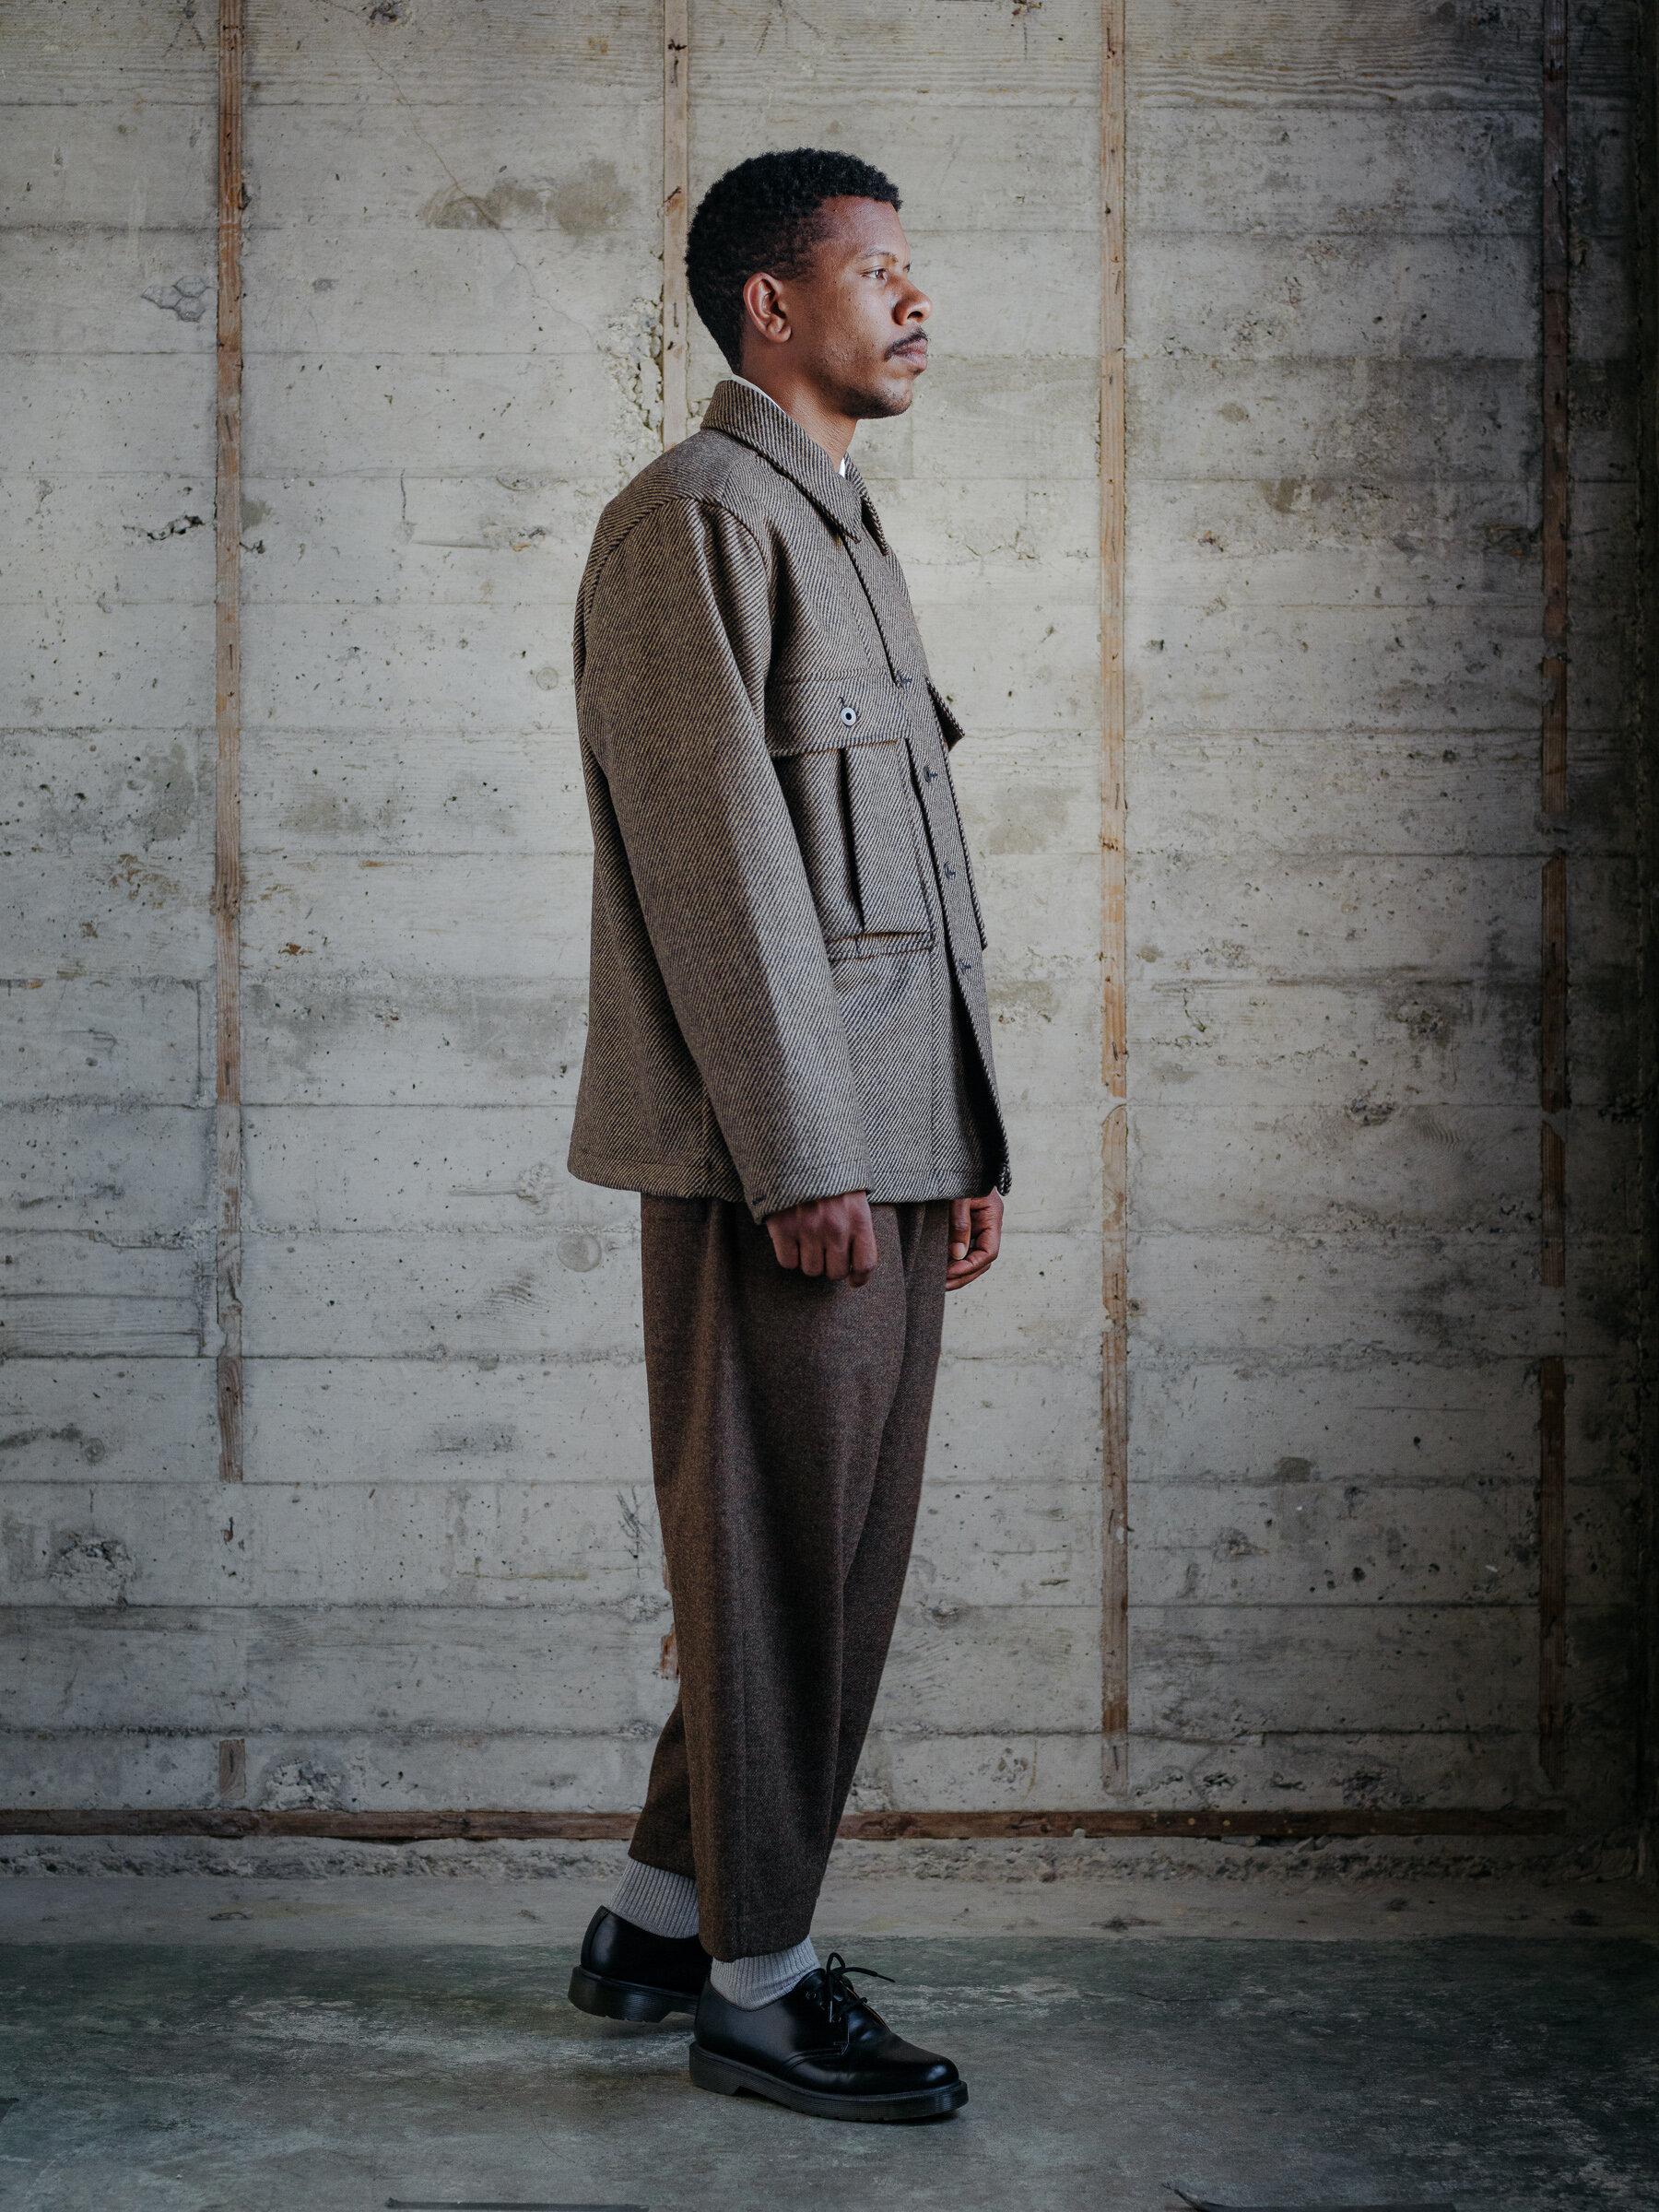 evan-kinori-bellow-pocket-jacket-lambswool-twill-woven-in-ireland-10